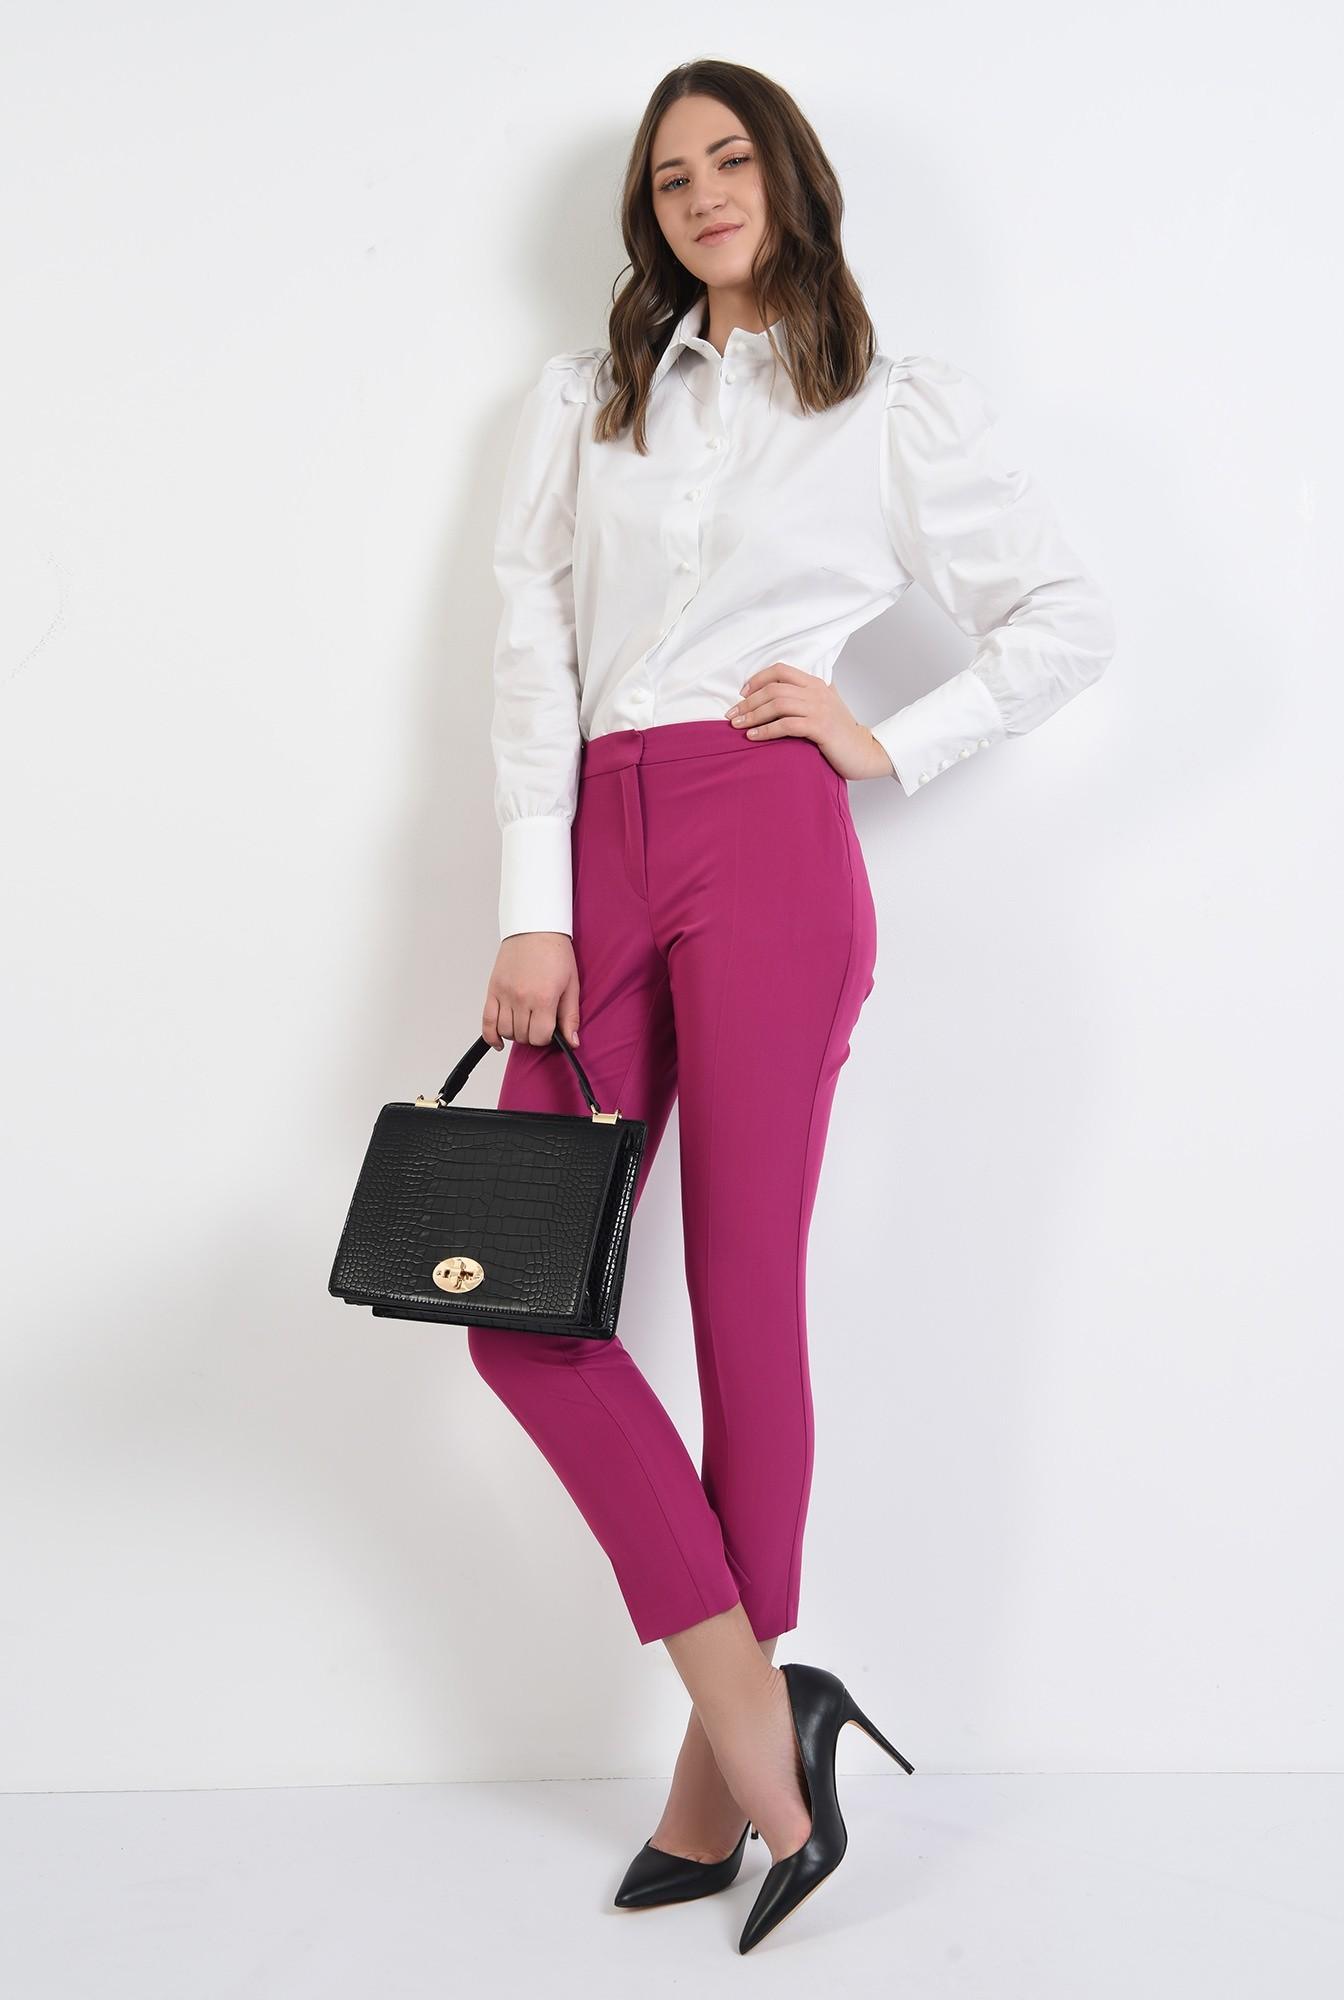 0 - pantaloni conici, croi tigareta, buzunare, talie medie